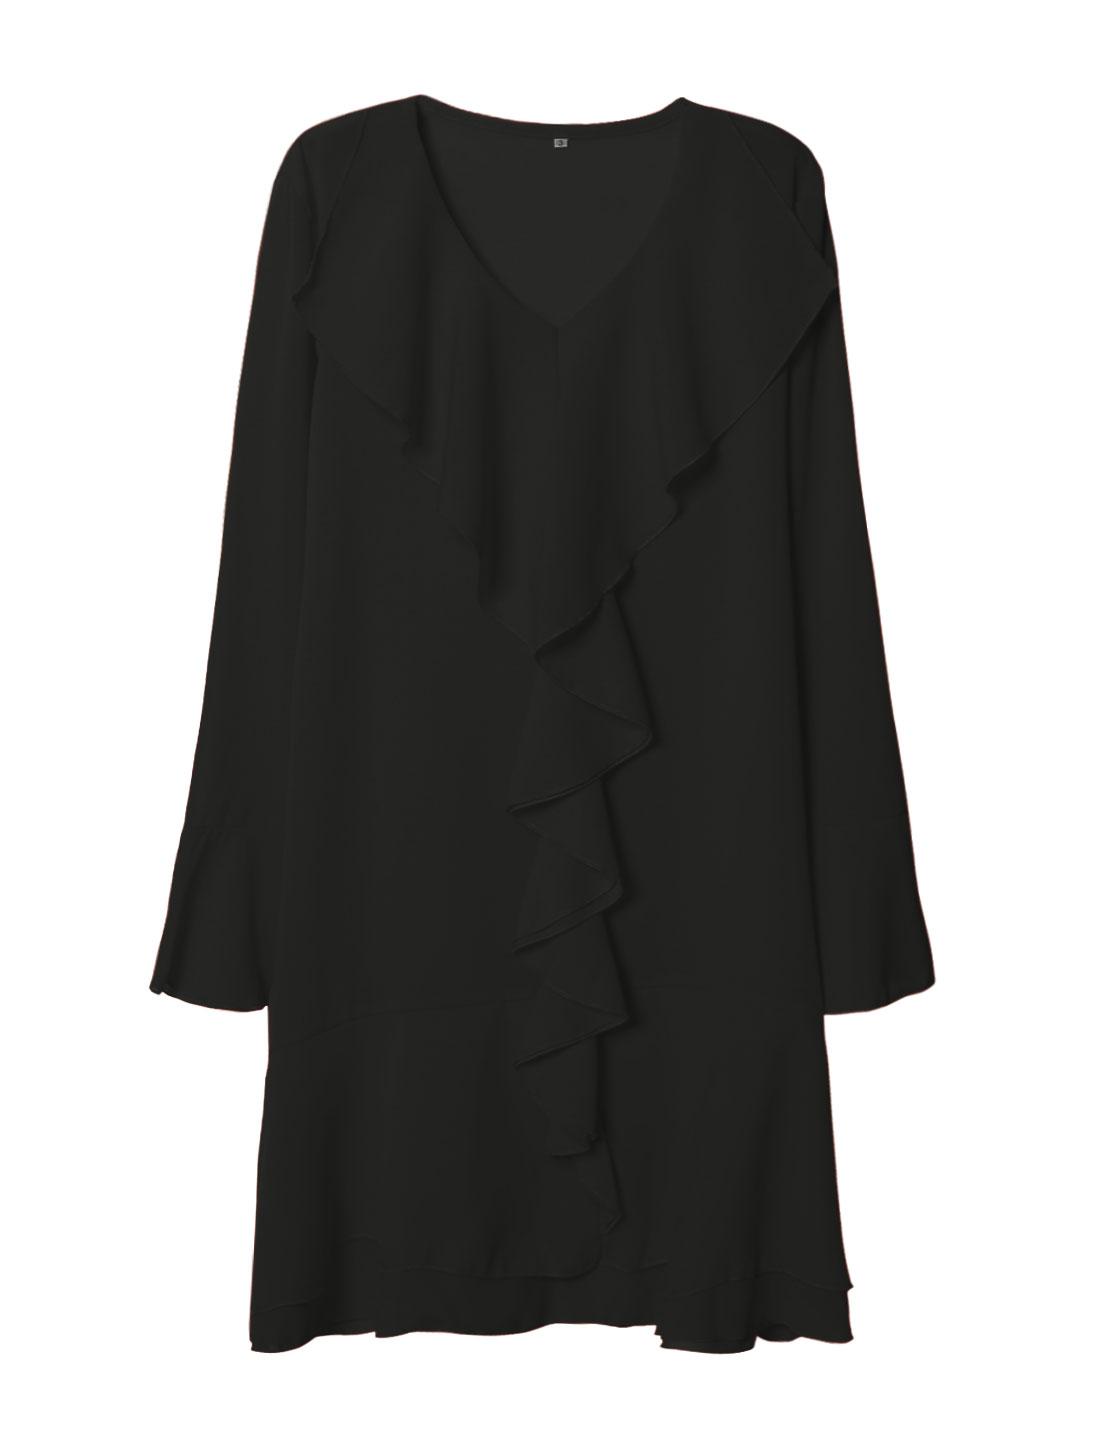 Women V Neck Bell Cuffs Ruffled Front Tiered Chiffon Dress Black M